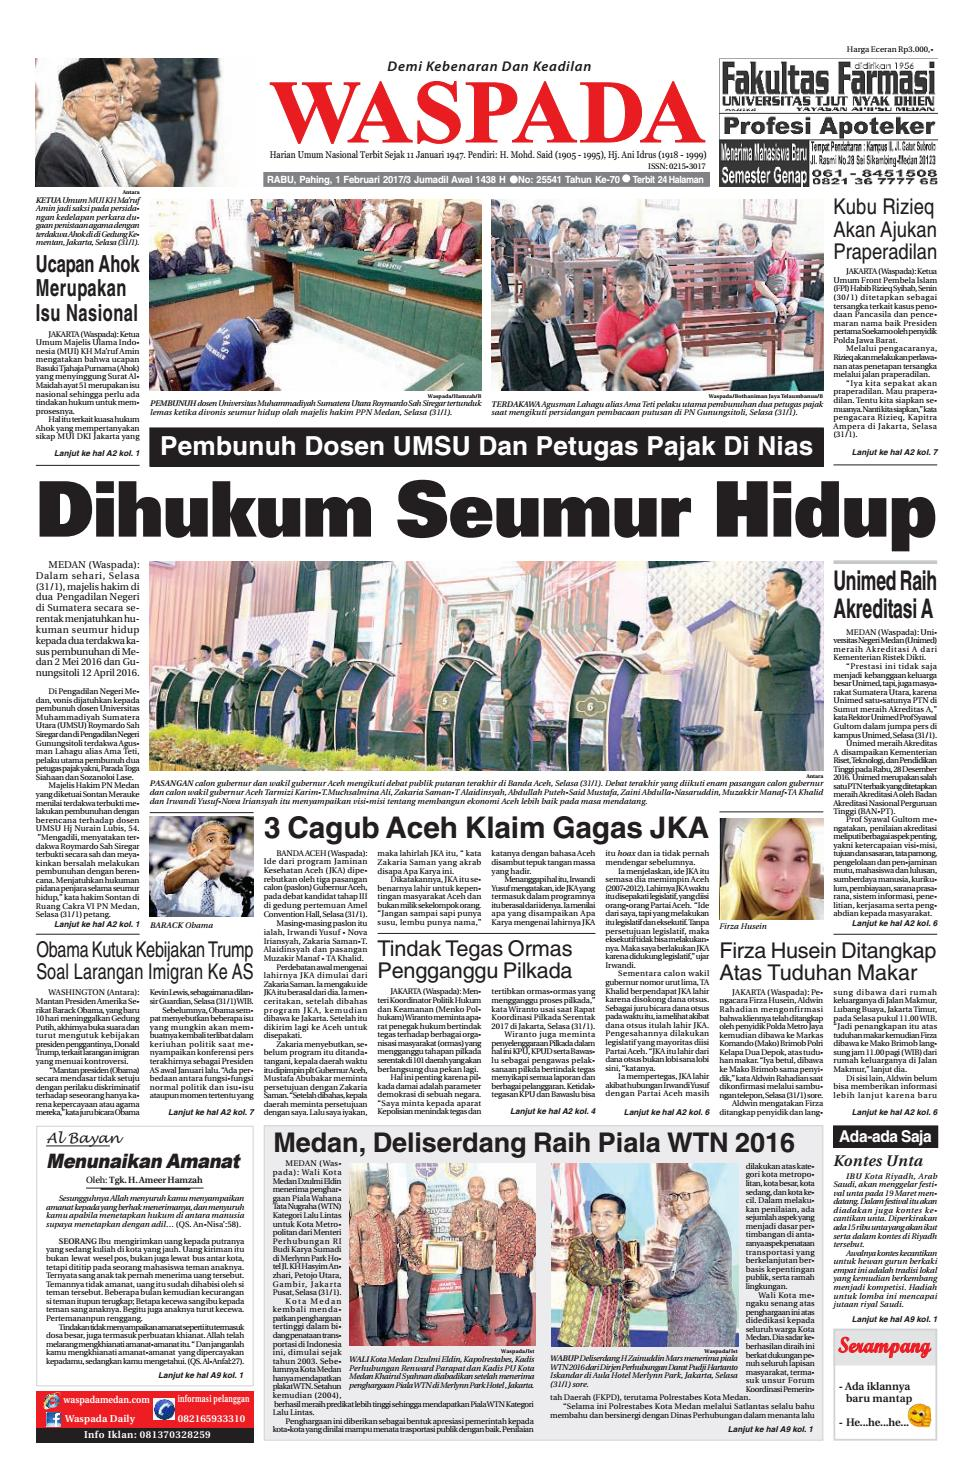 Waspadarabu 1 Februari 2017 By Waspada Daily Issuu Kopi Bos Ila Arifin Amr